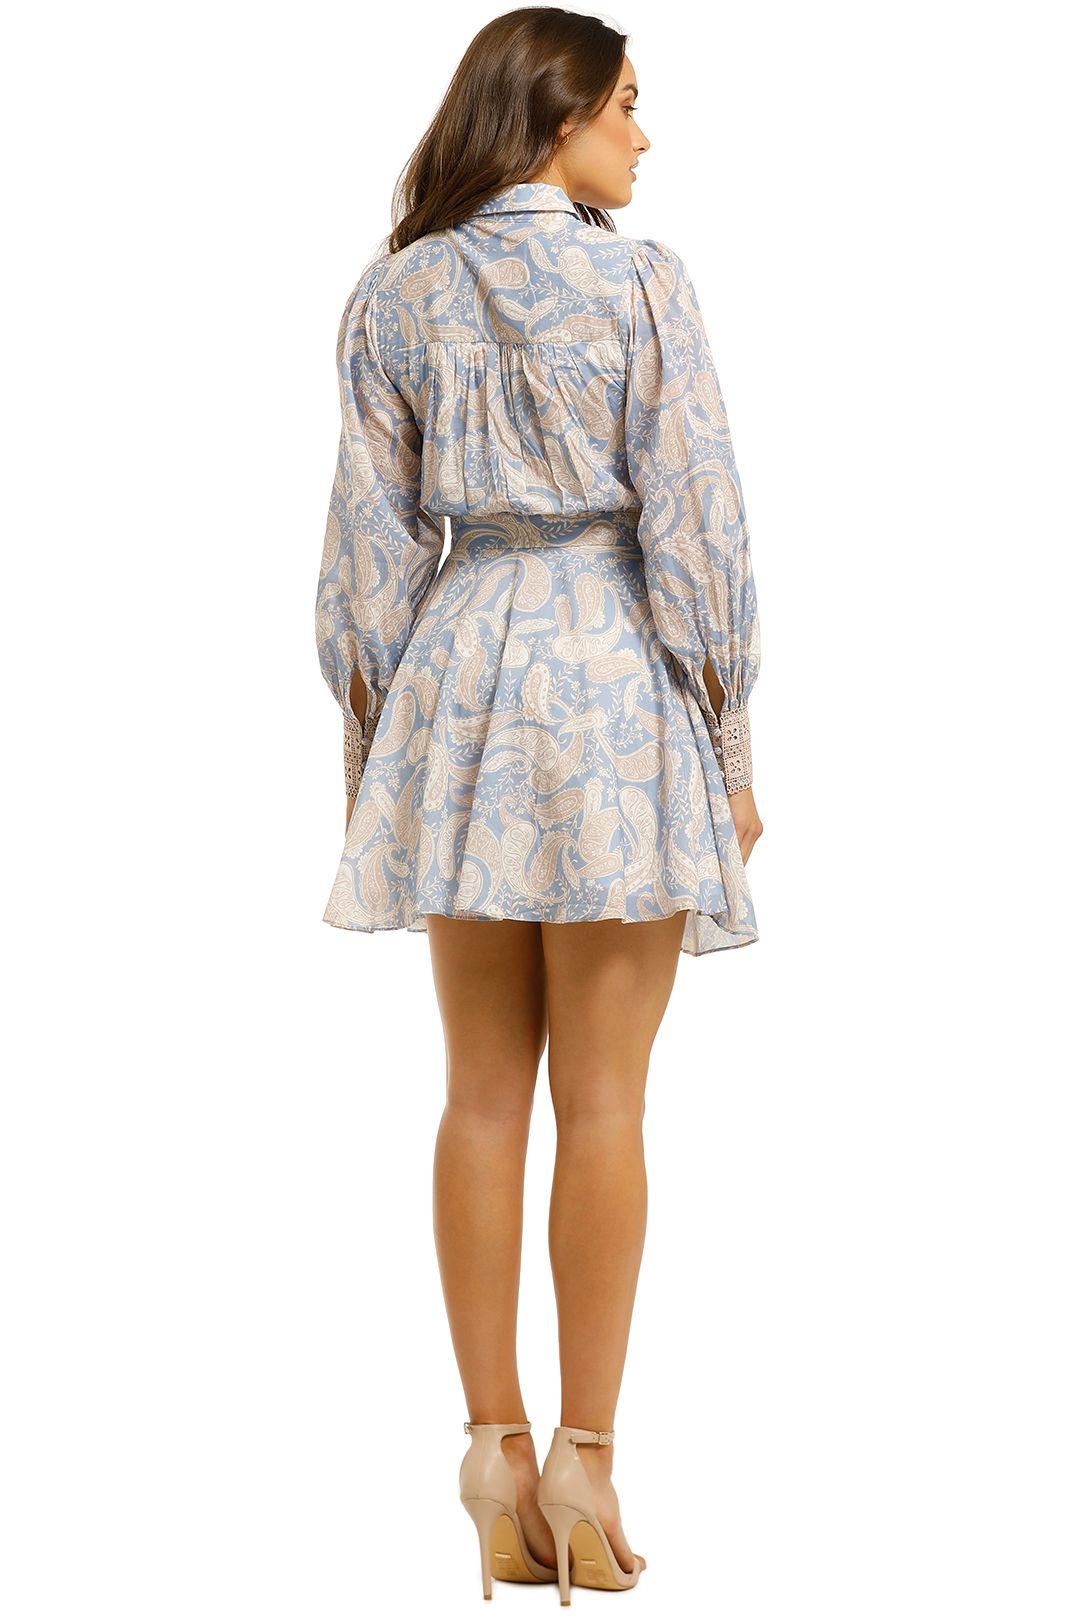 We-Are-Kindred-Sorrento-Mini-Dress-Cornflower-Paisley-Back